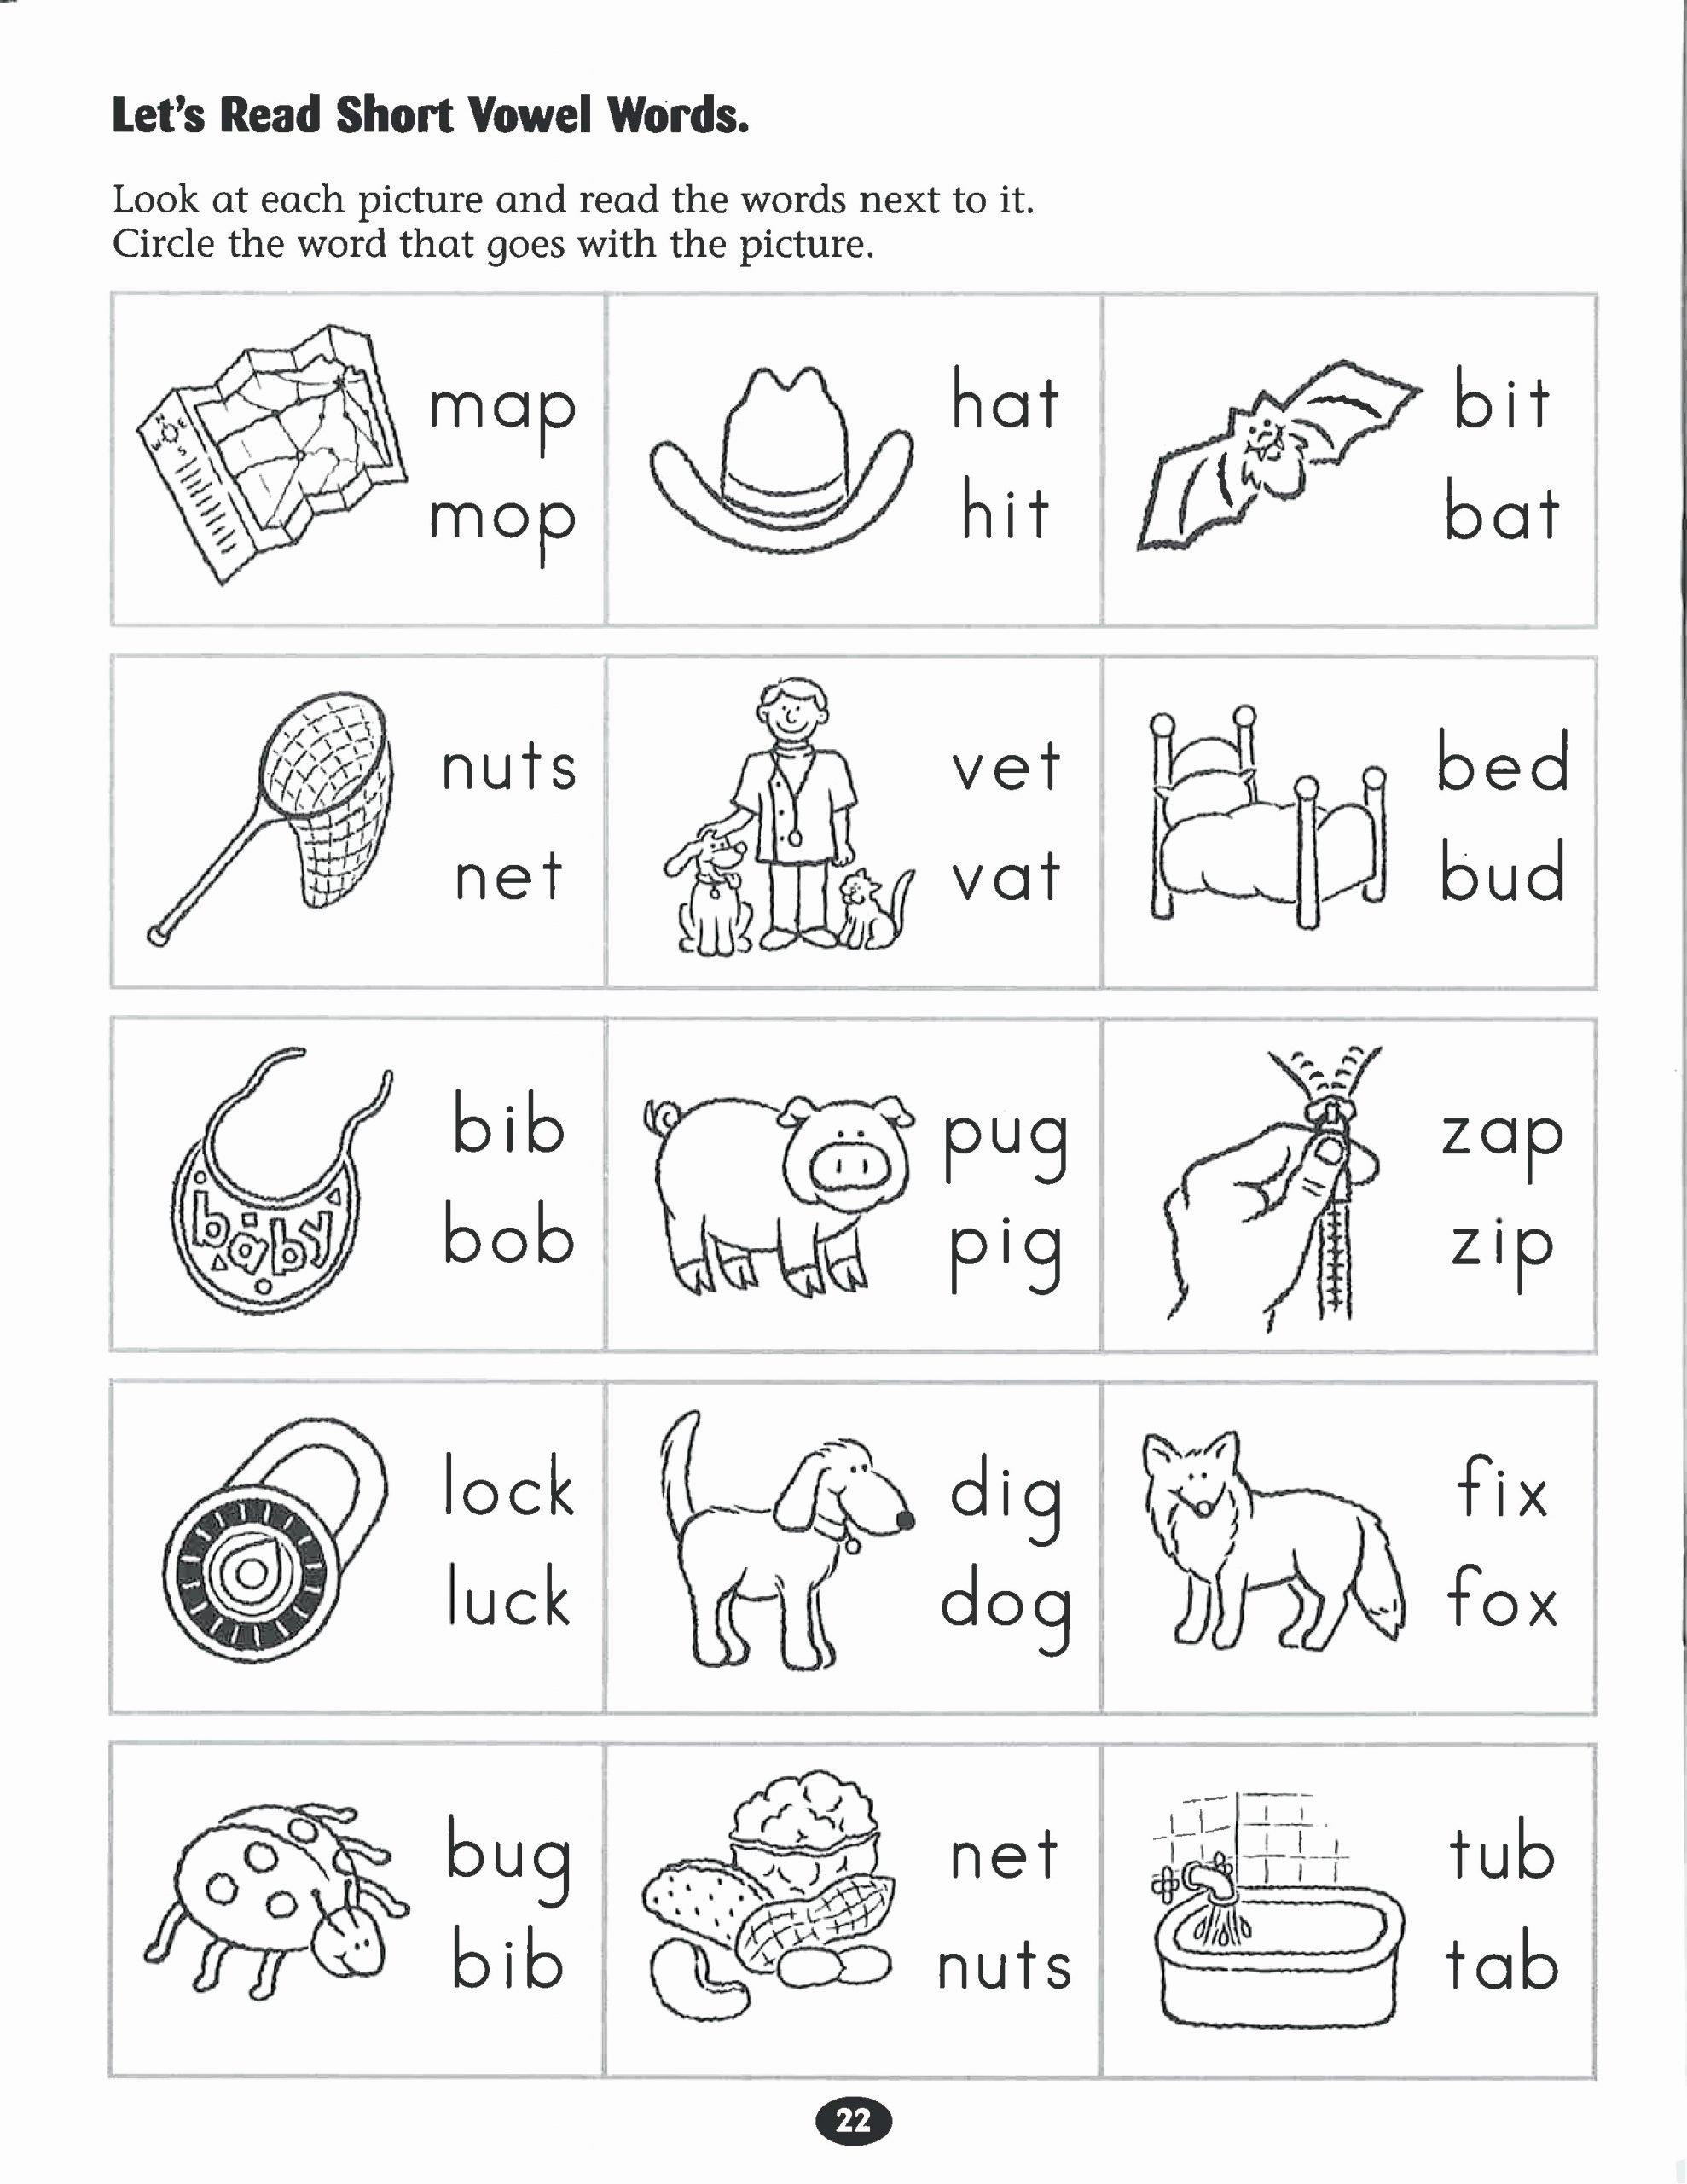 Jolly Phonics Worksheets for Preschoolers Beautiful Jolly Phonics Tensesa Worksheet